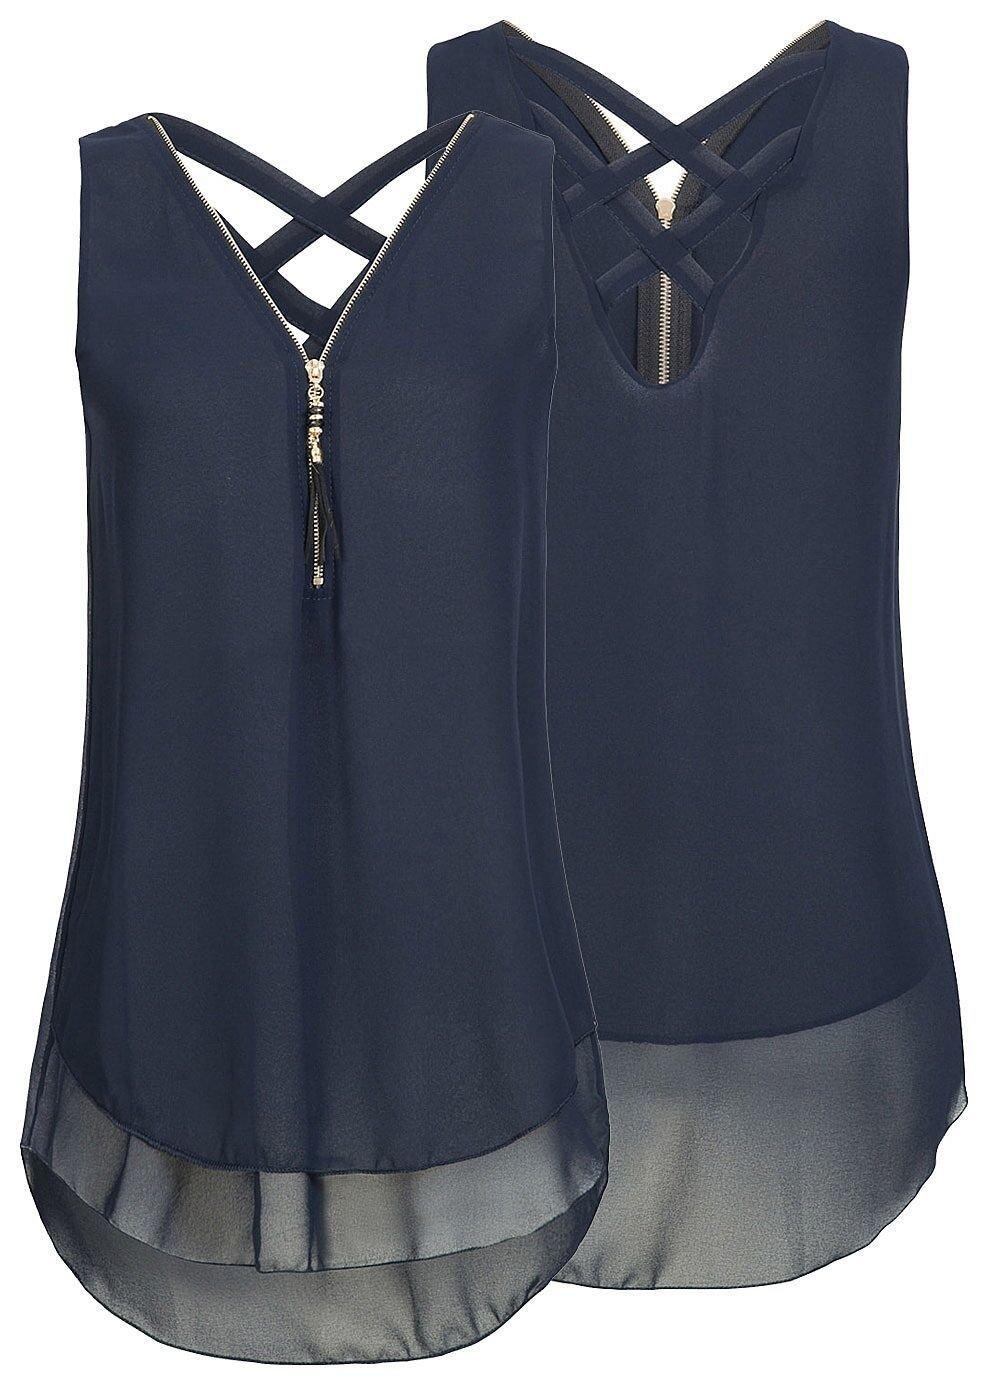 Yknktstc Womens Casual Sleeveless V Neck Chiffon Tank Top Crisscross Back Zipper Blouse T Shirt Small Style 2-Navy